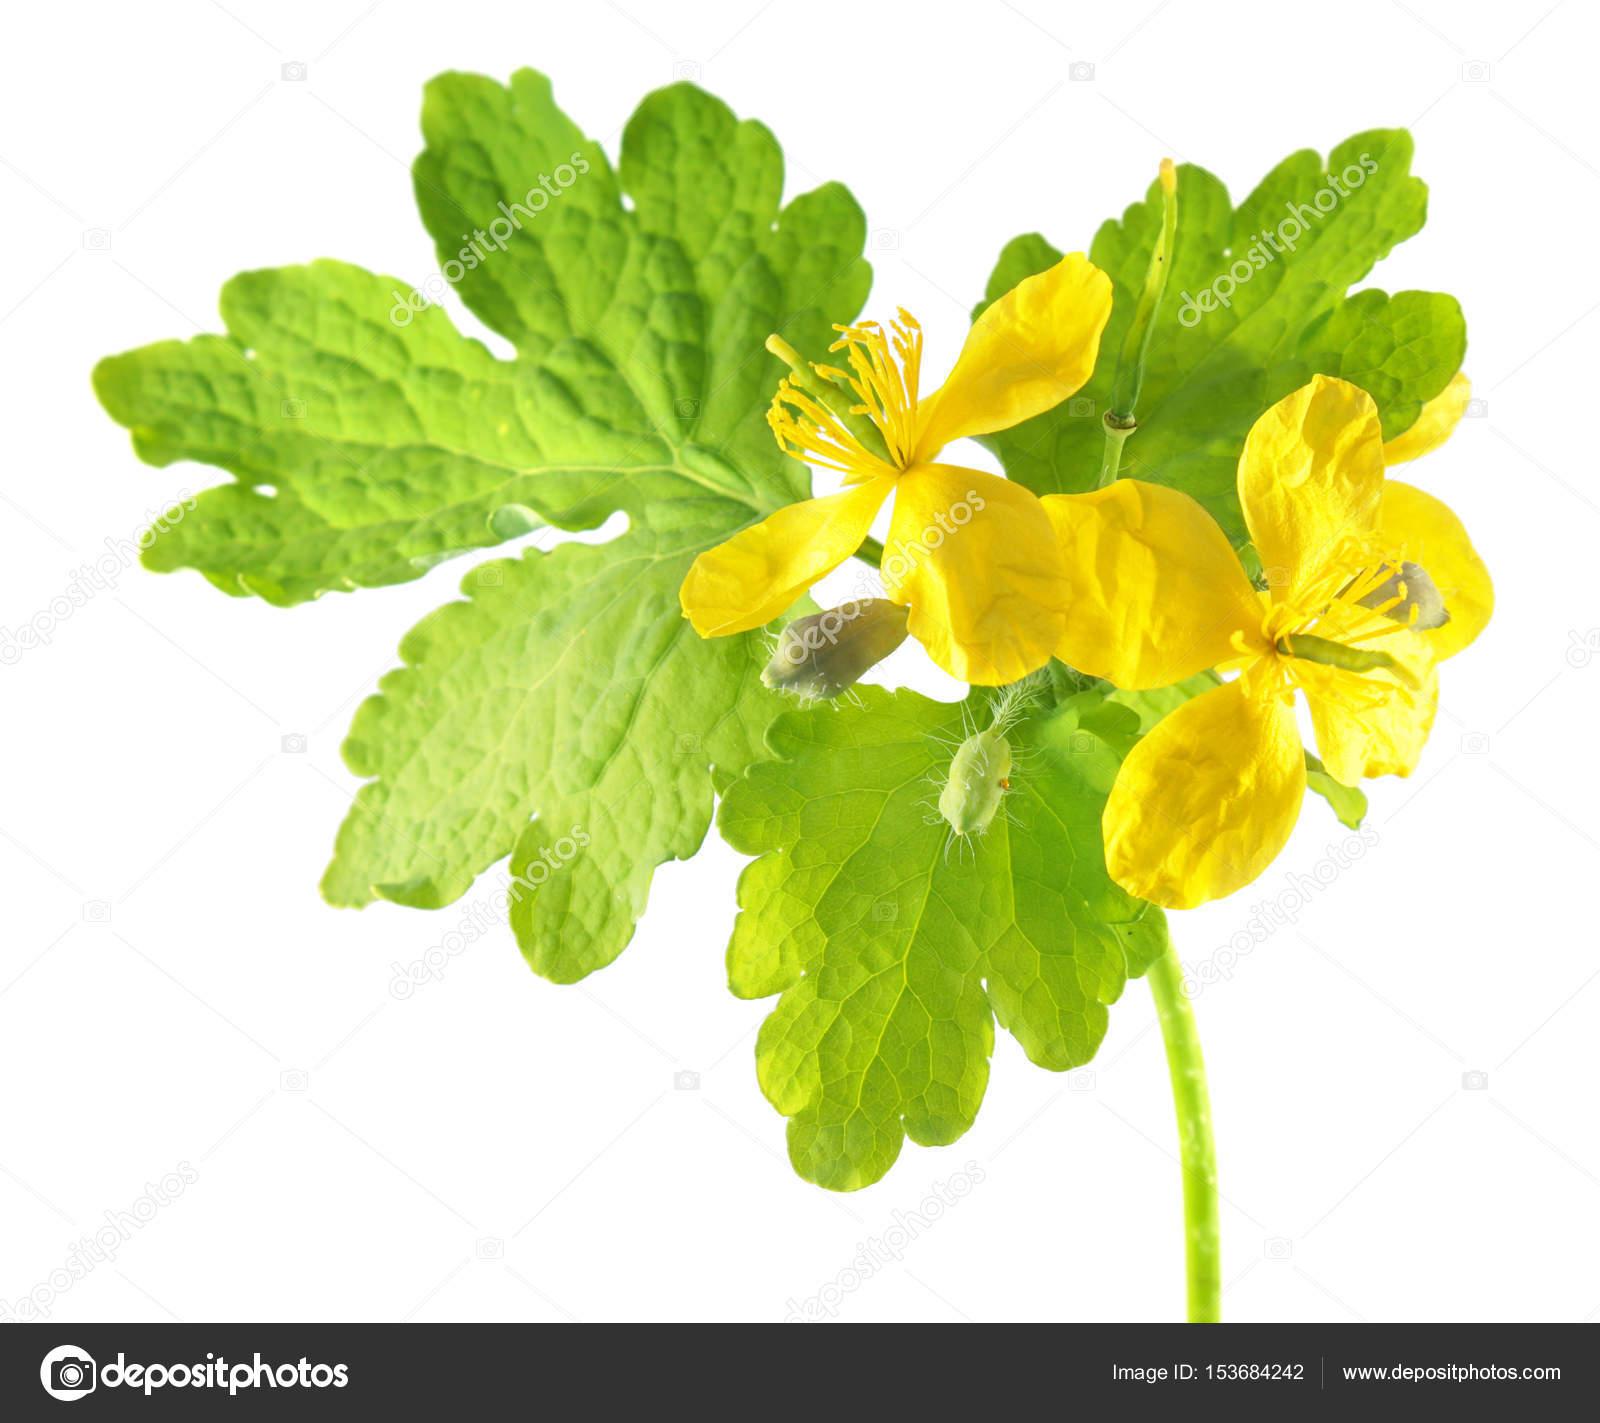 Celidonia Planta Medicinal Mexico Venta Celidonia O Tetterwort